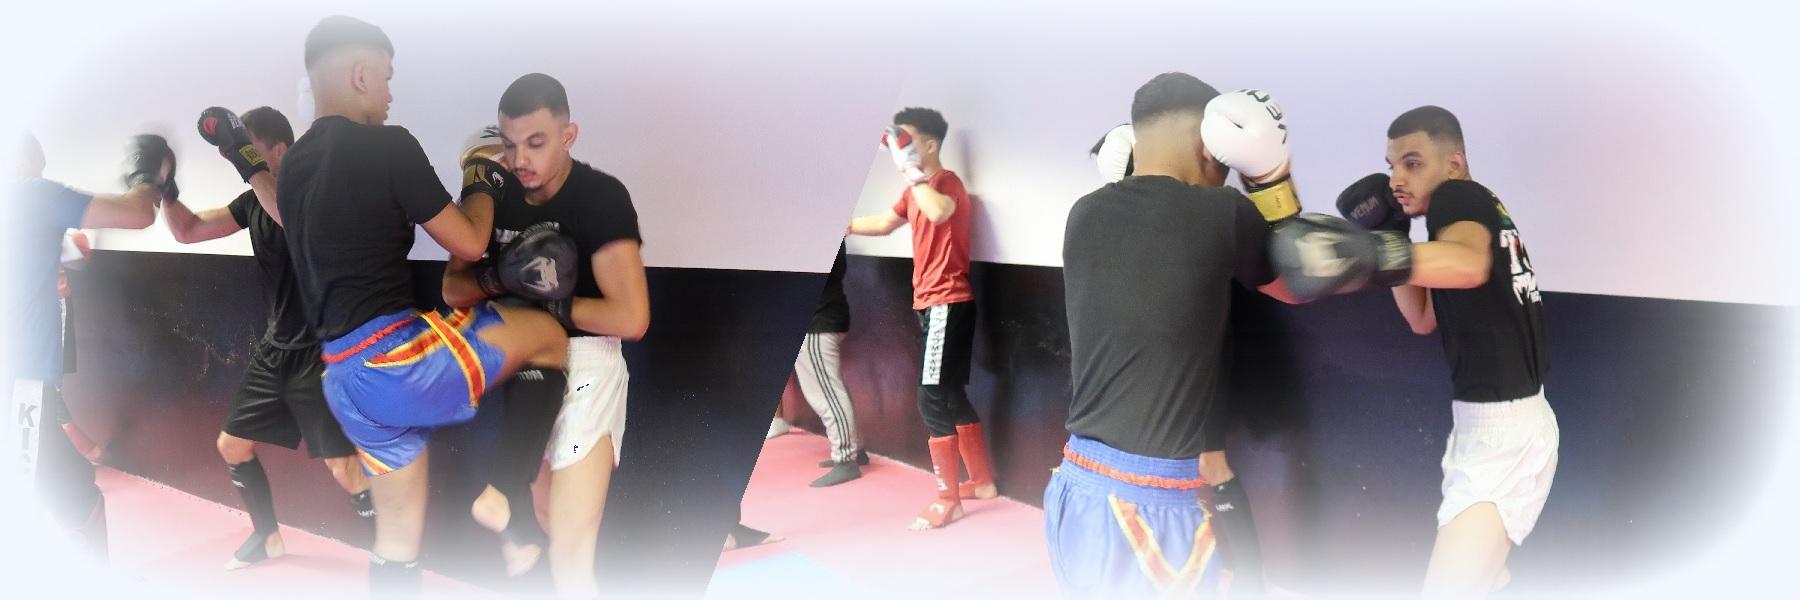 Kickboxen-Header-2